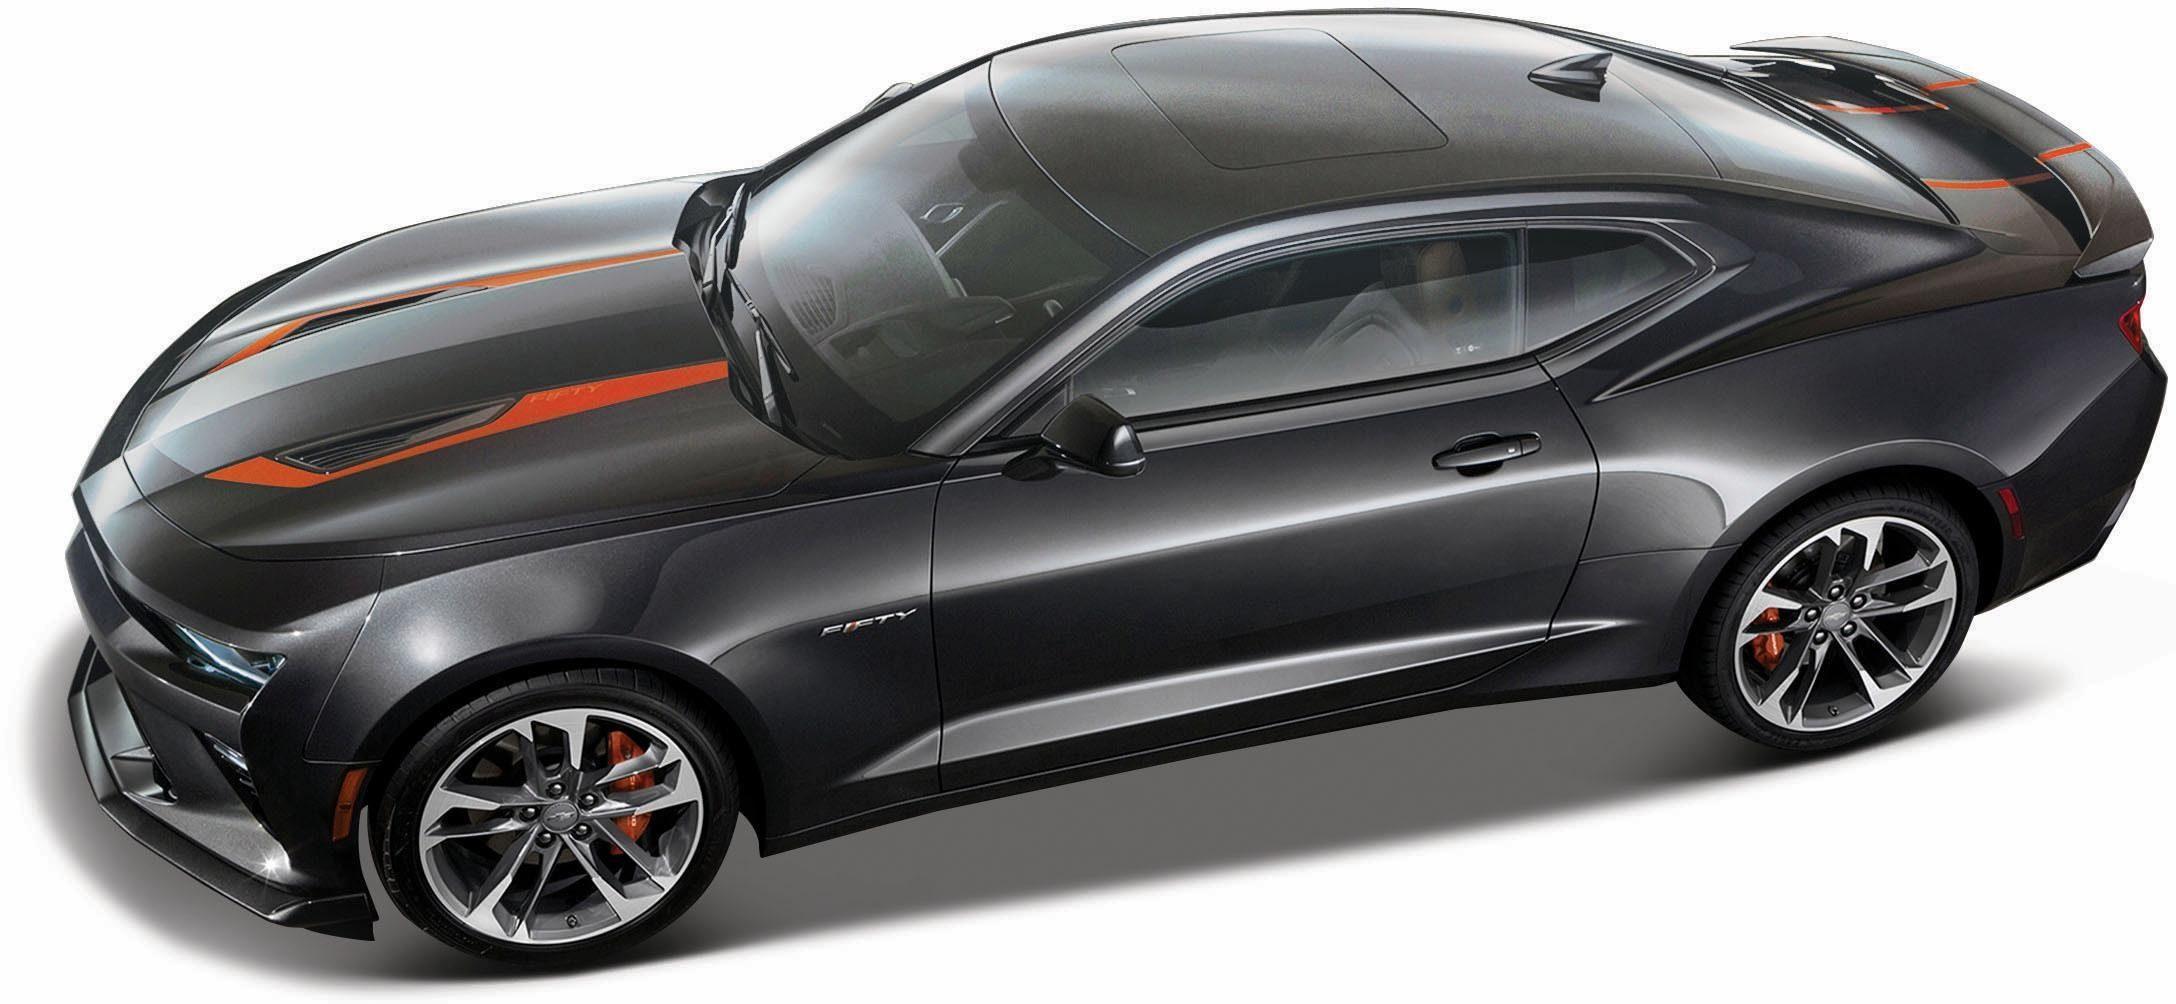 Maisto® Sammlerauto, »Chevrolet Camaro '17, 1:18, metallgrau«